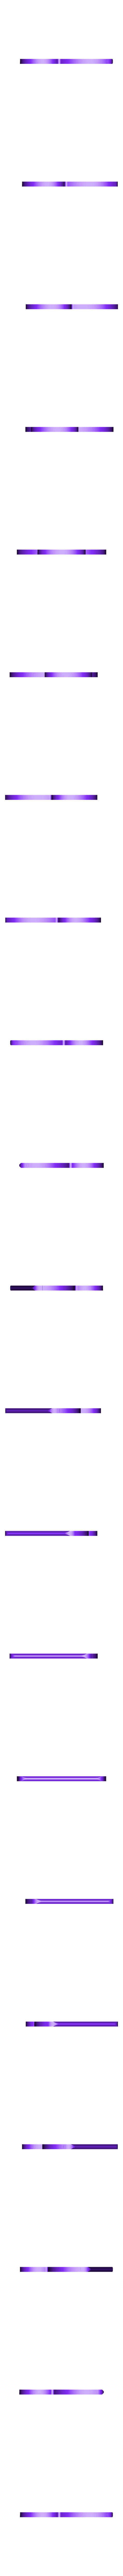 Organizer_Ring.stl Download free STL file Key Organizer Carabiner • Design to 3D print, MuSSy